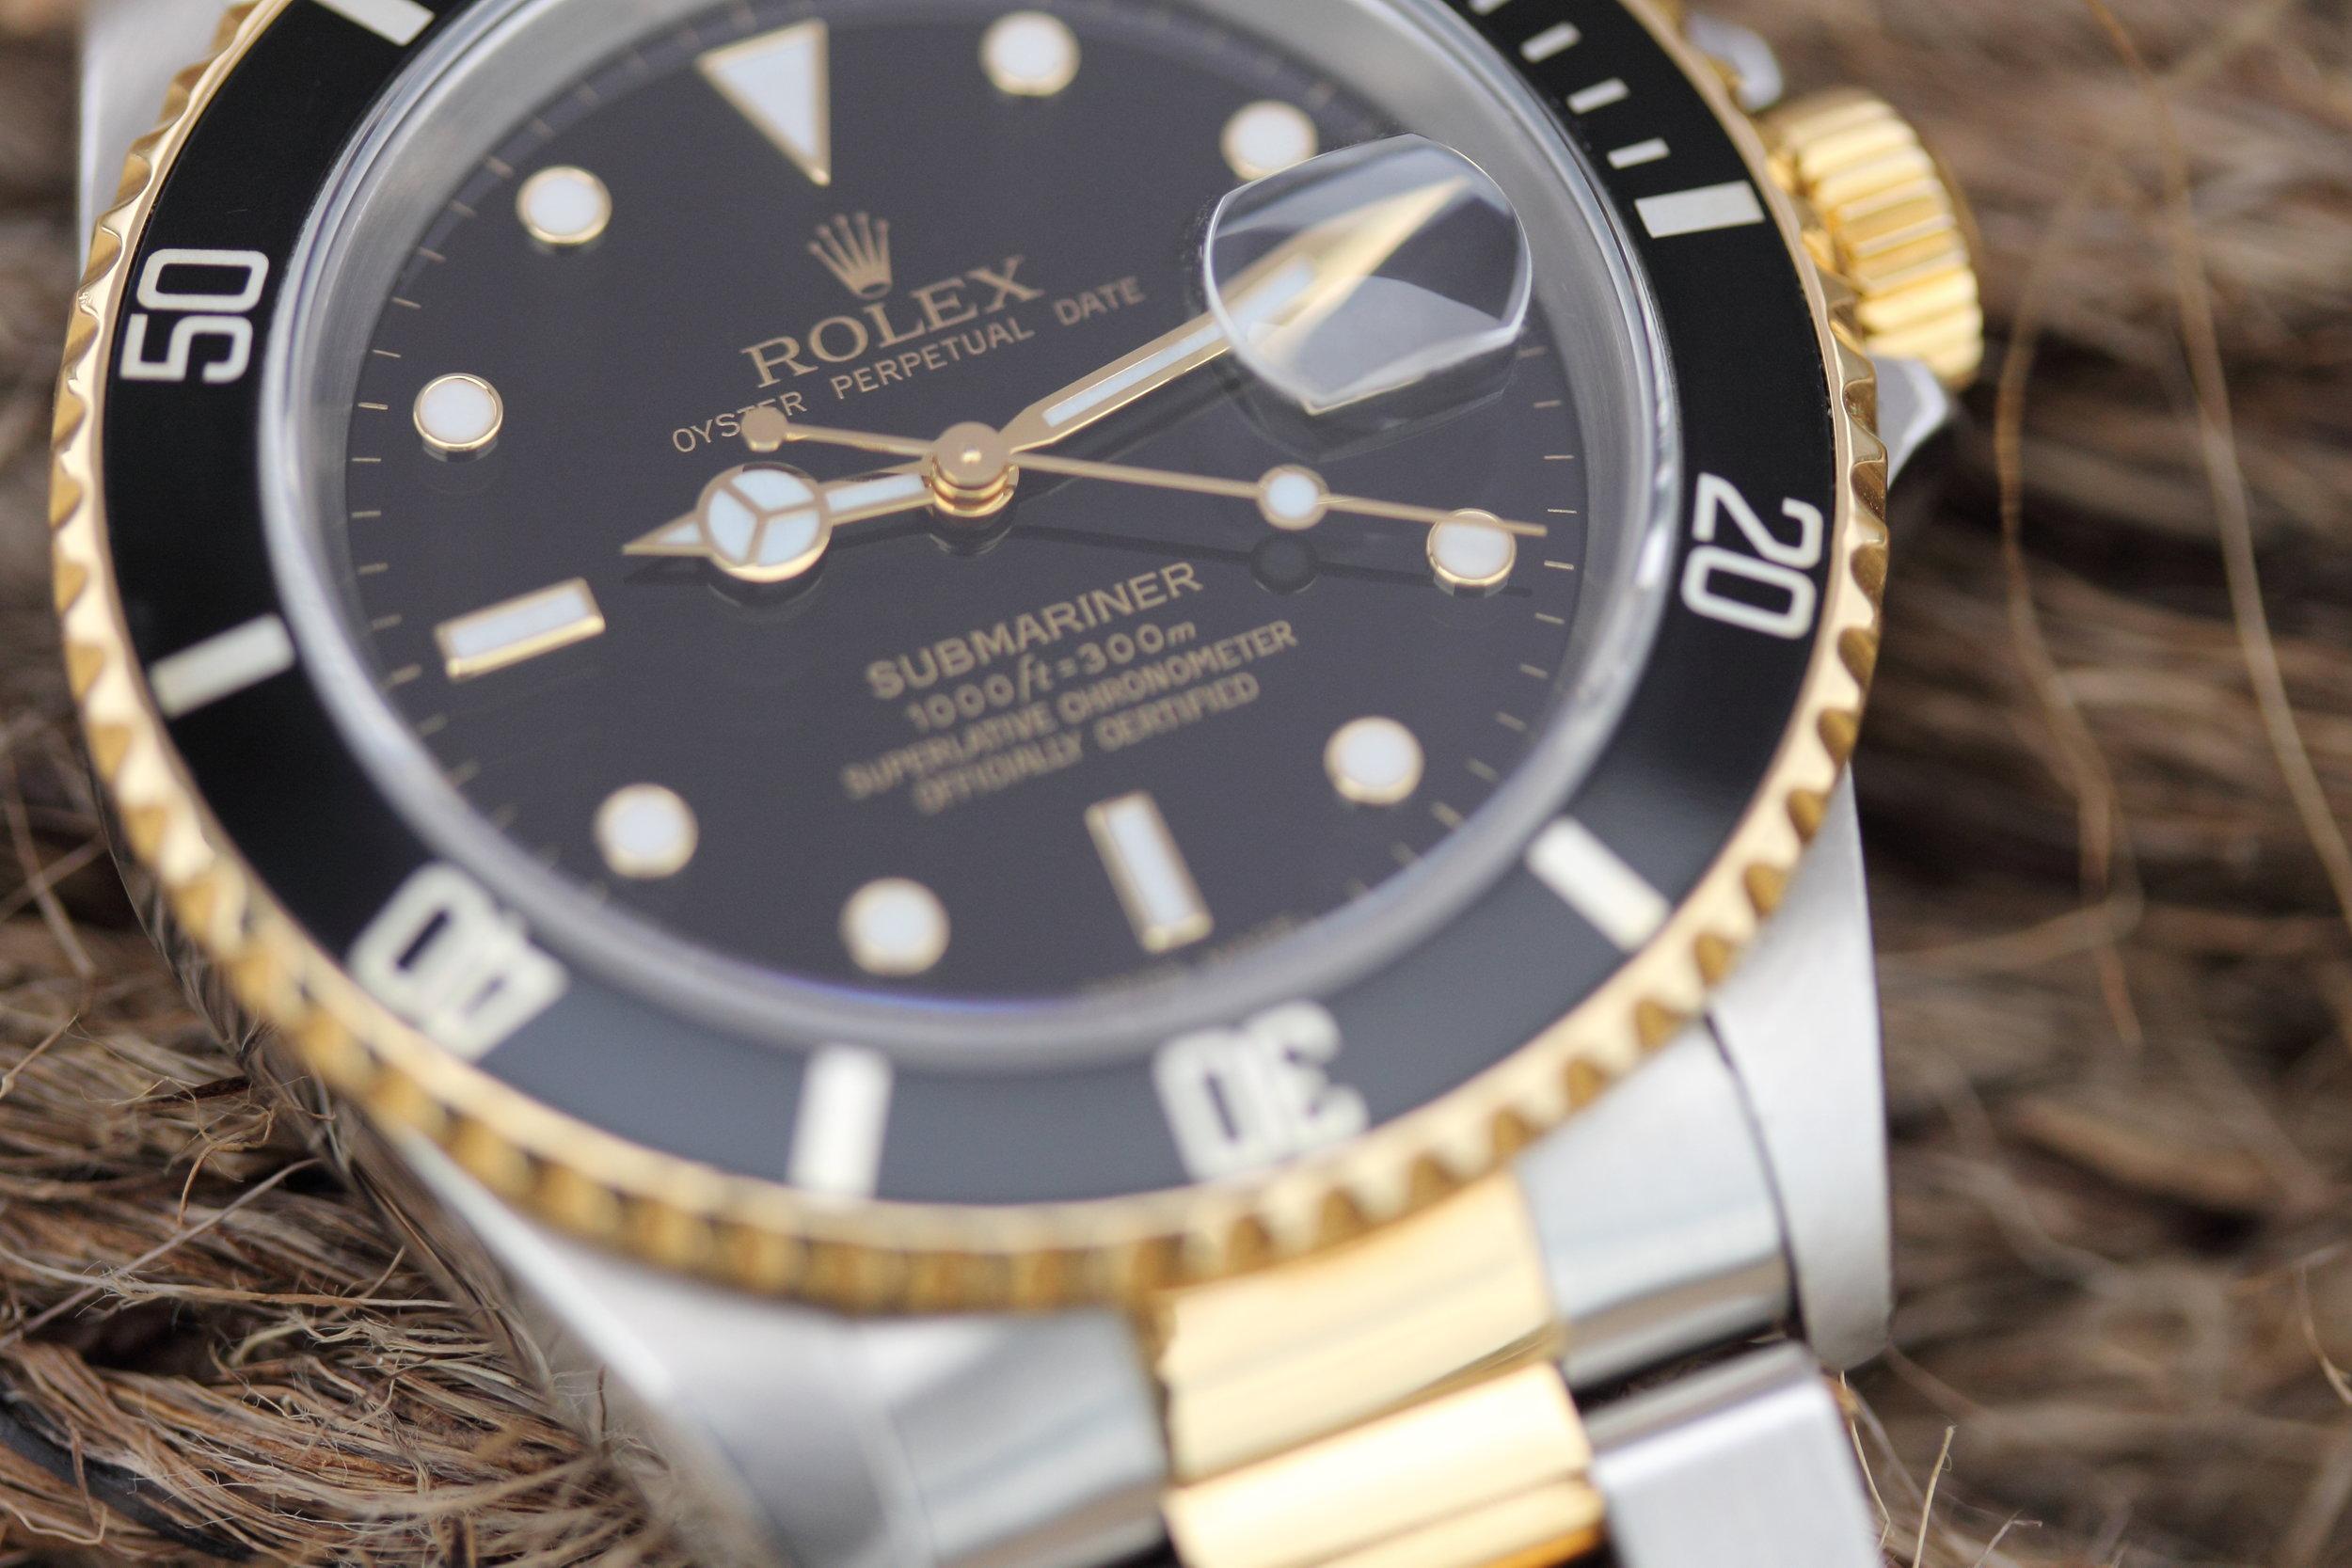 Hard To Say Goodbye: Bill's Rolex Submariner